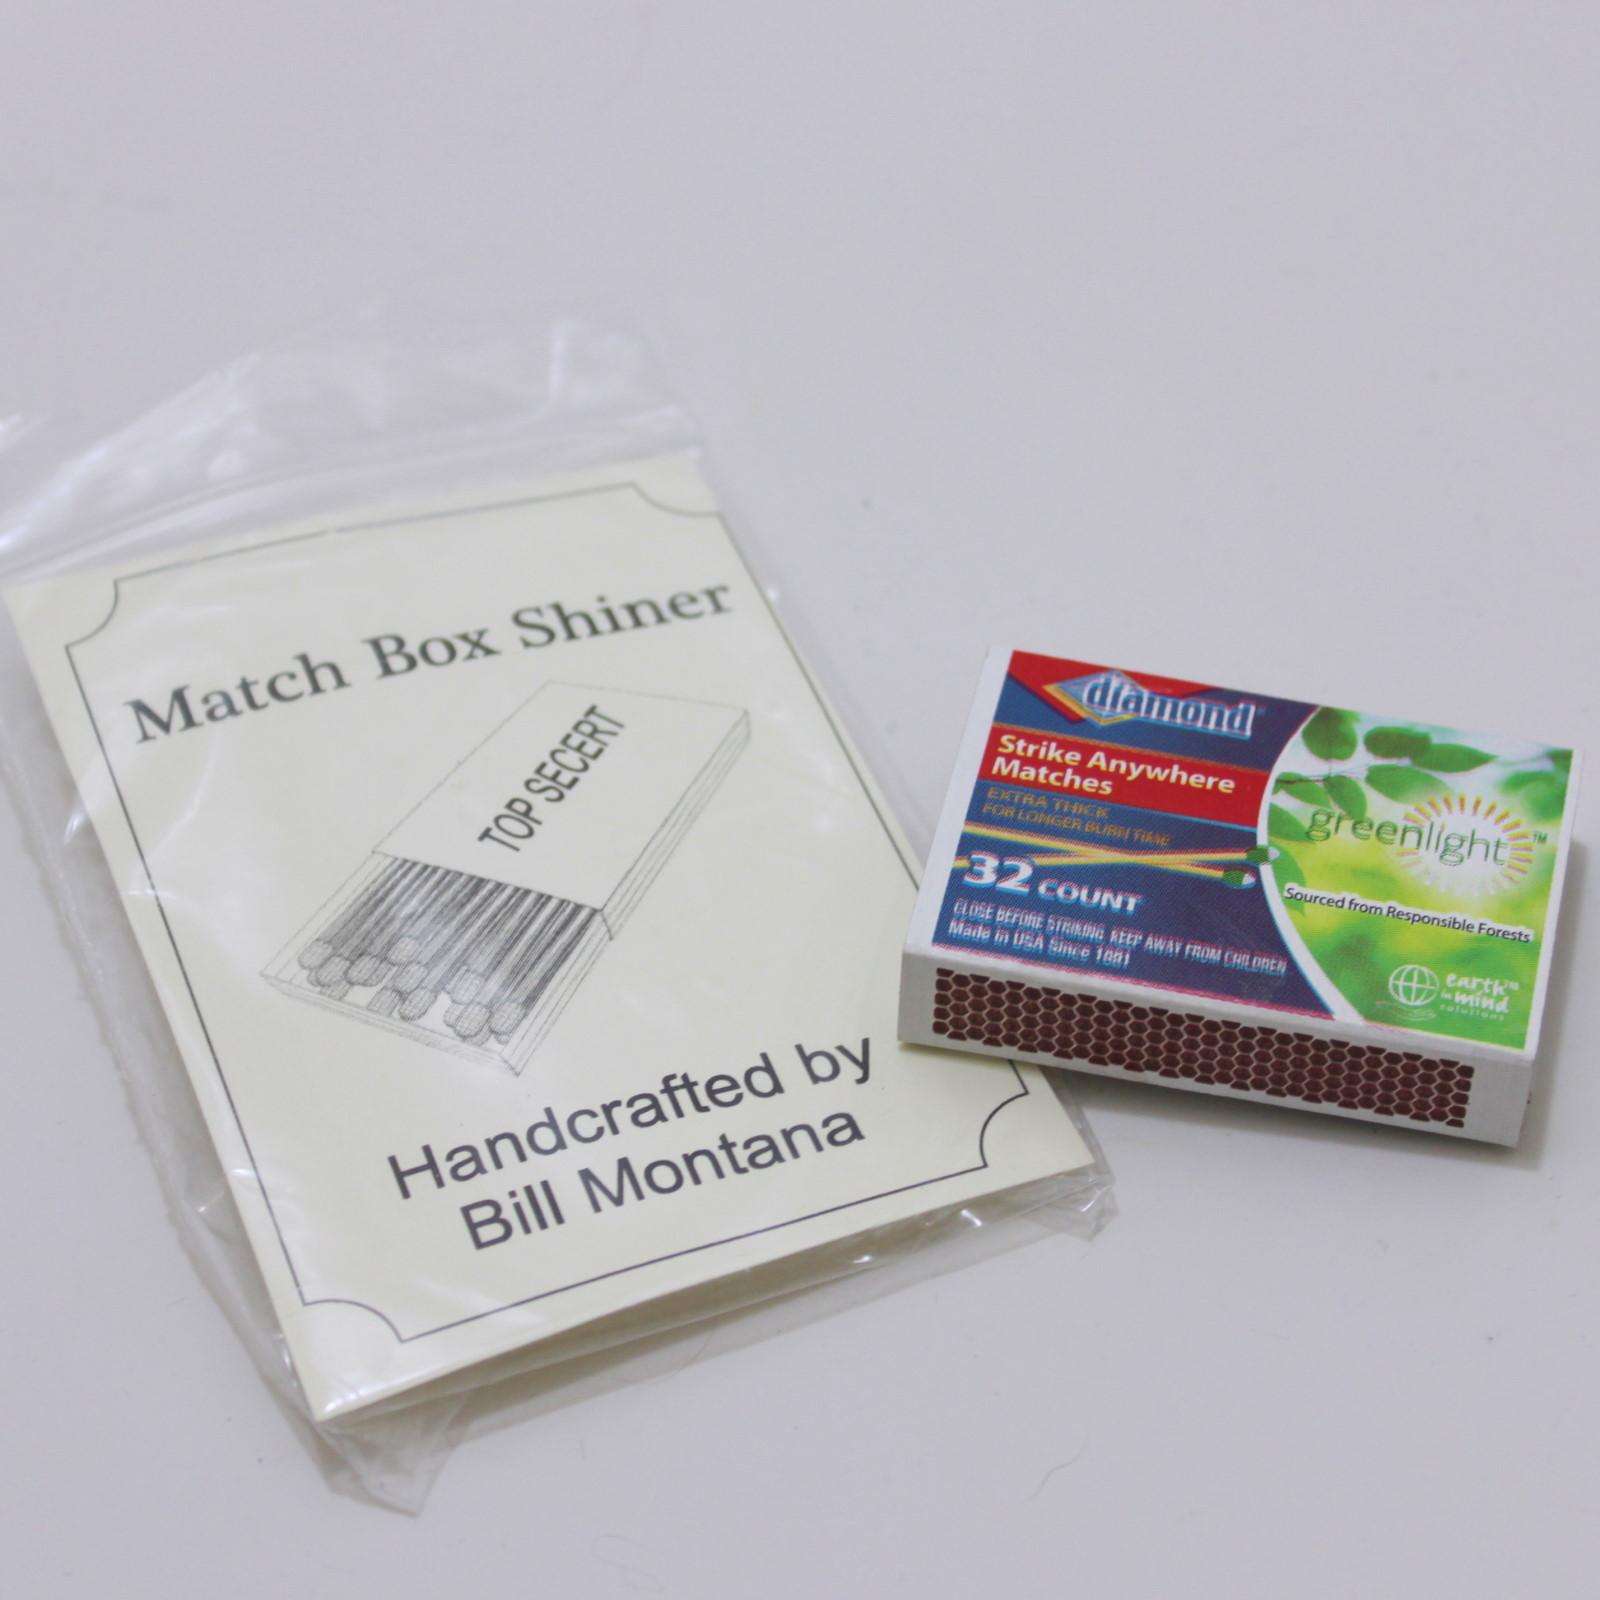 Matchbox Shiner by Bill Montana